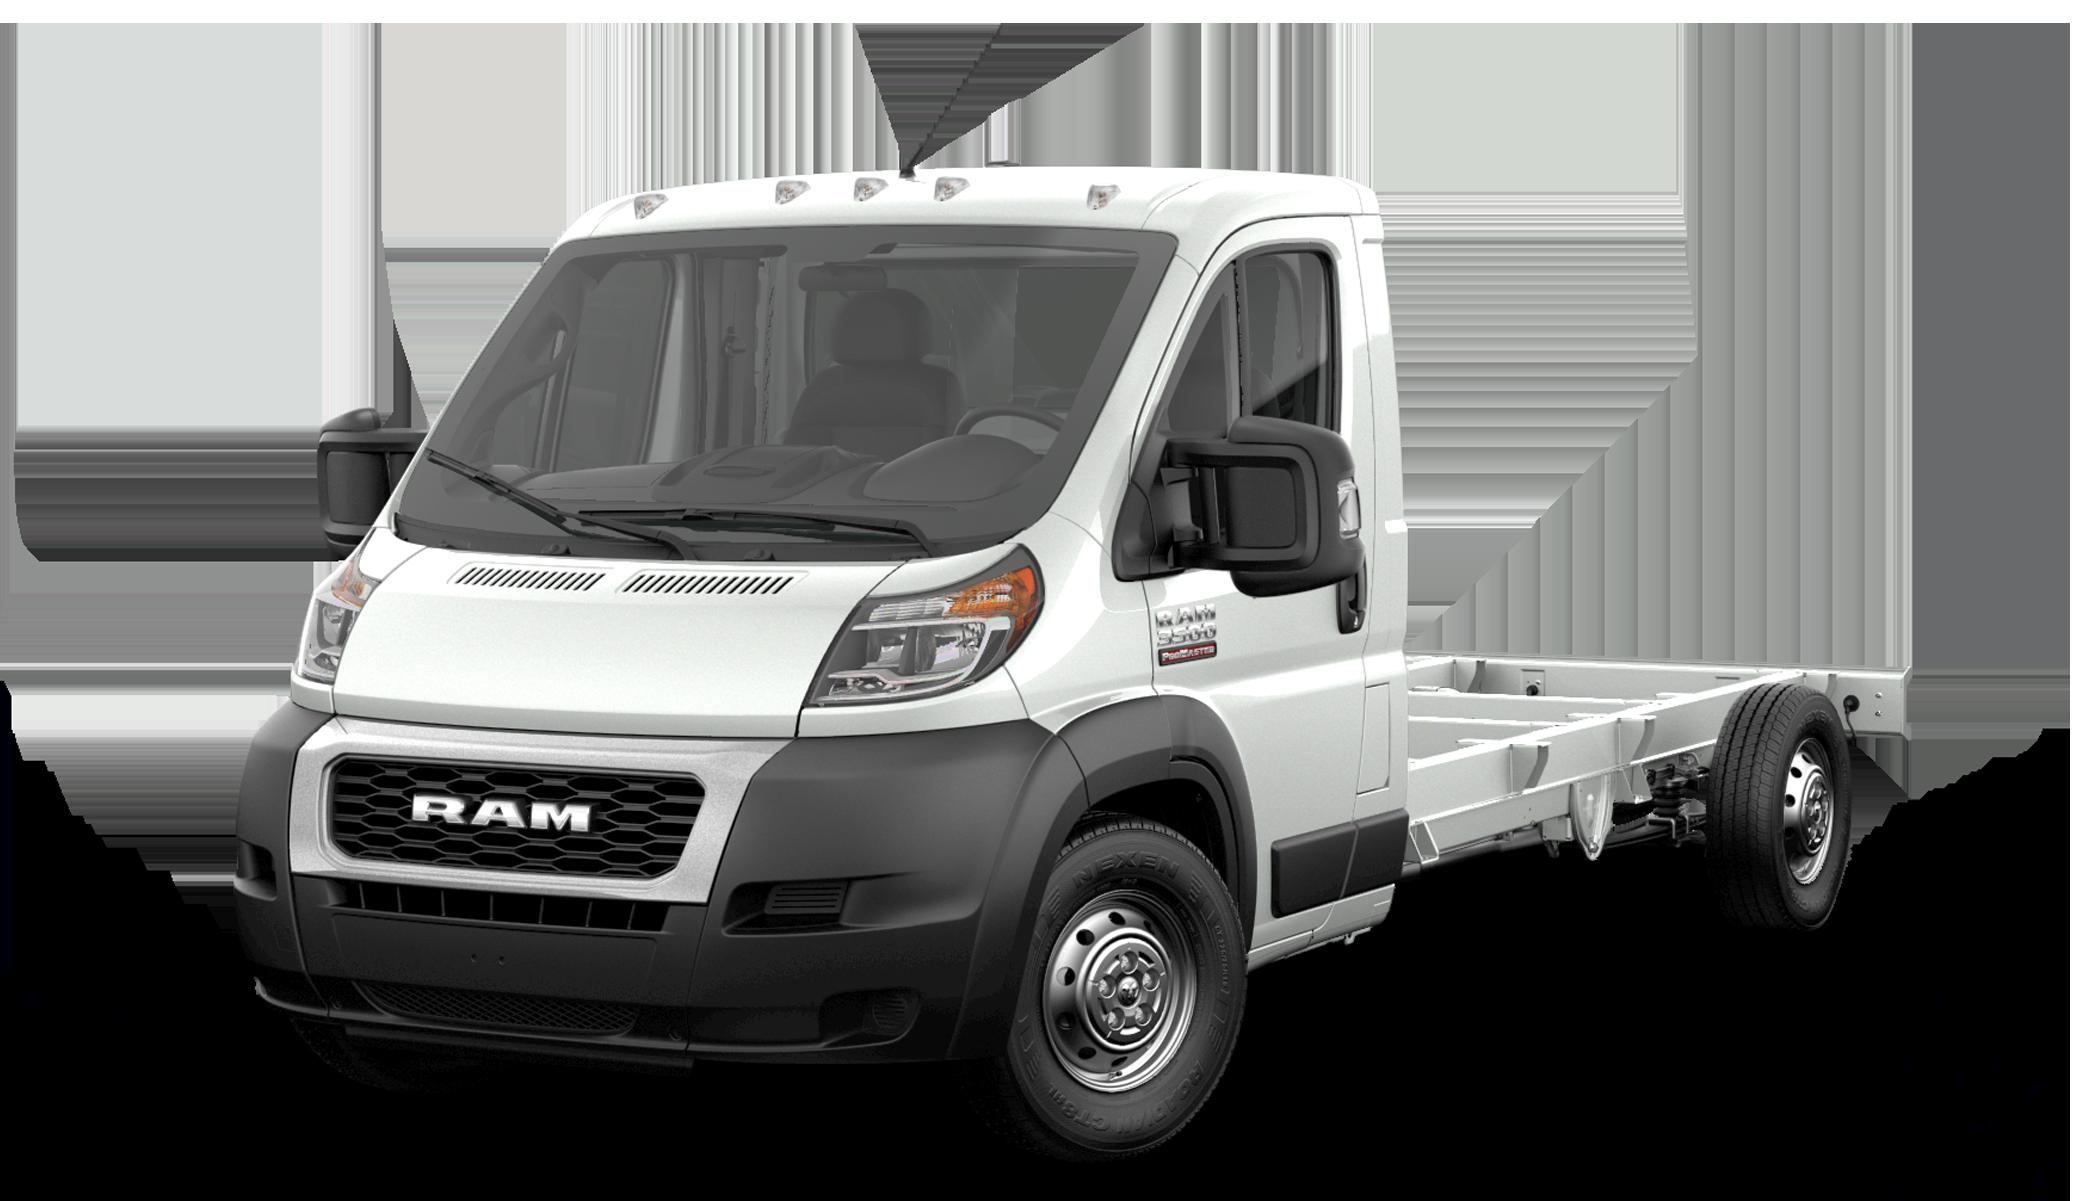 dodge ram promaster incentives 2019 Ram ProMaster 3500 Cutaway Incentives, Specials